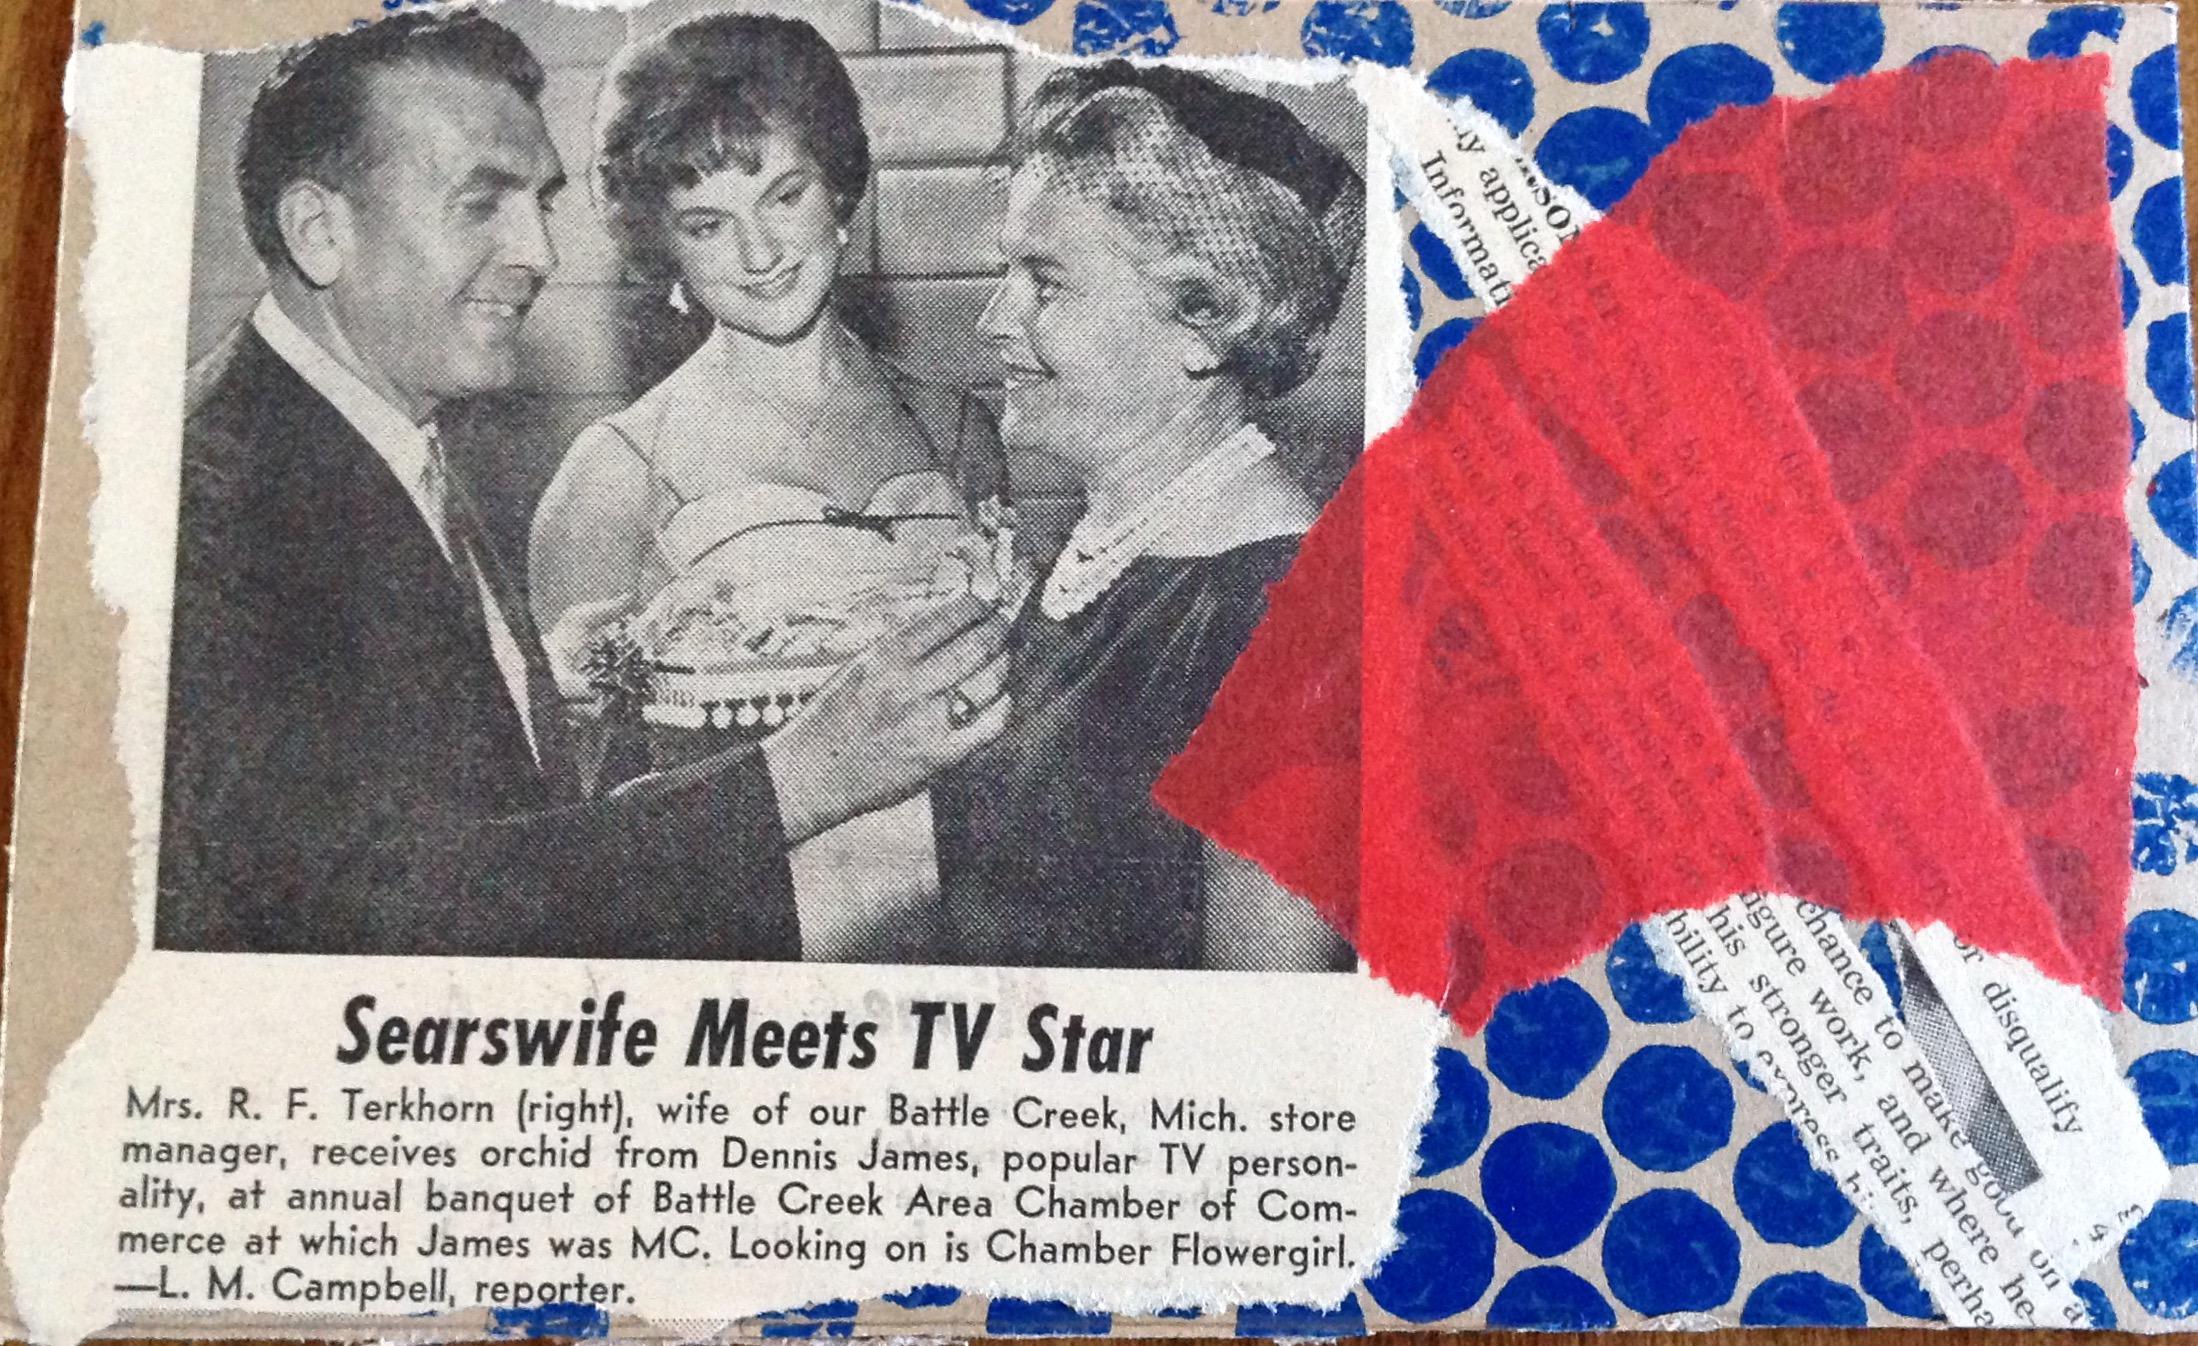 Sears Wife Meets TV Star by tonipoet